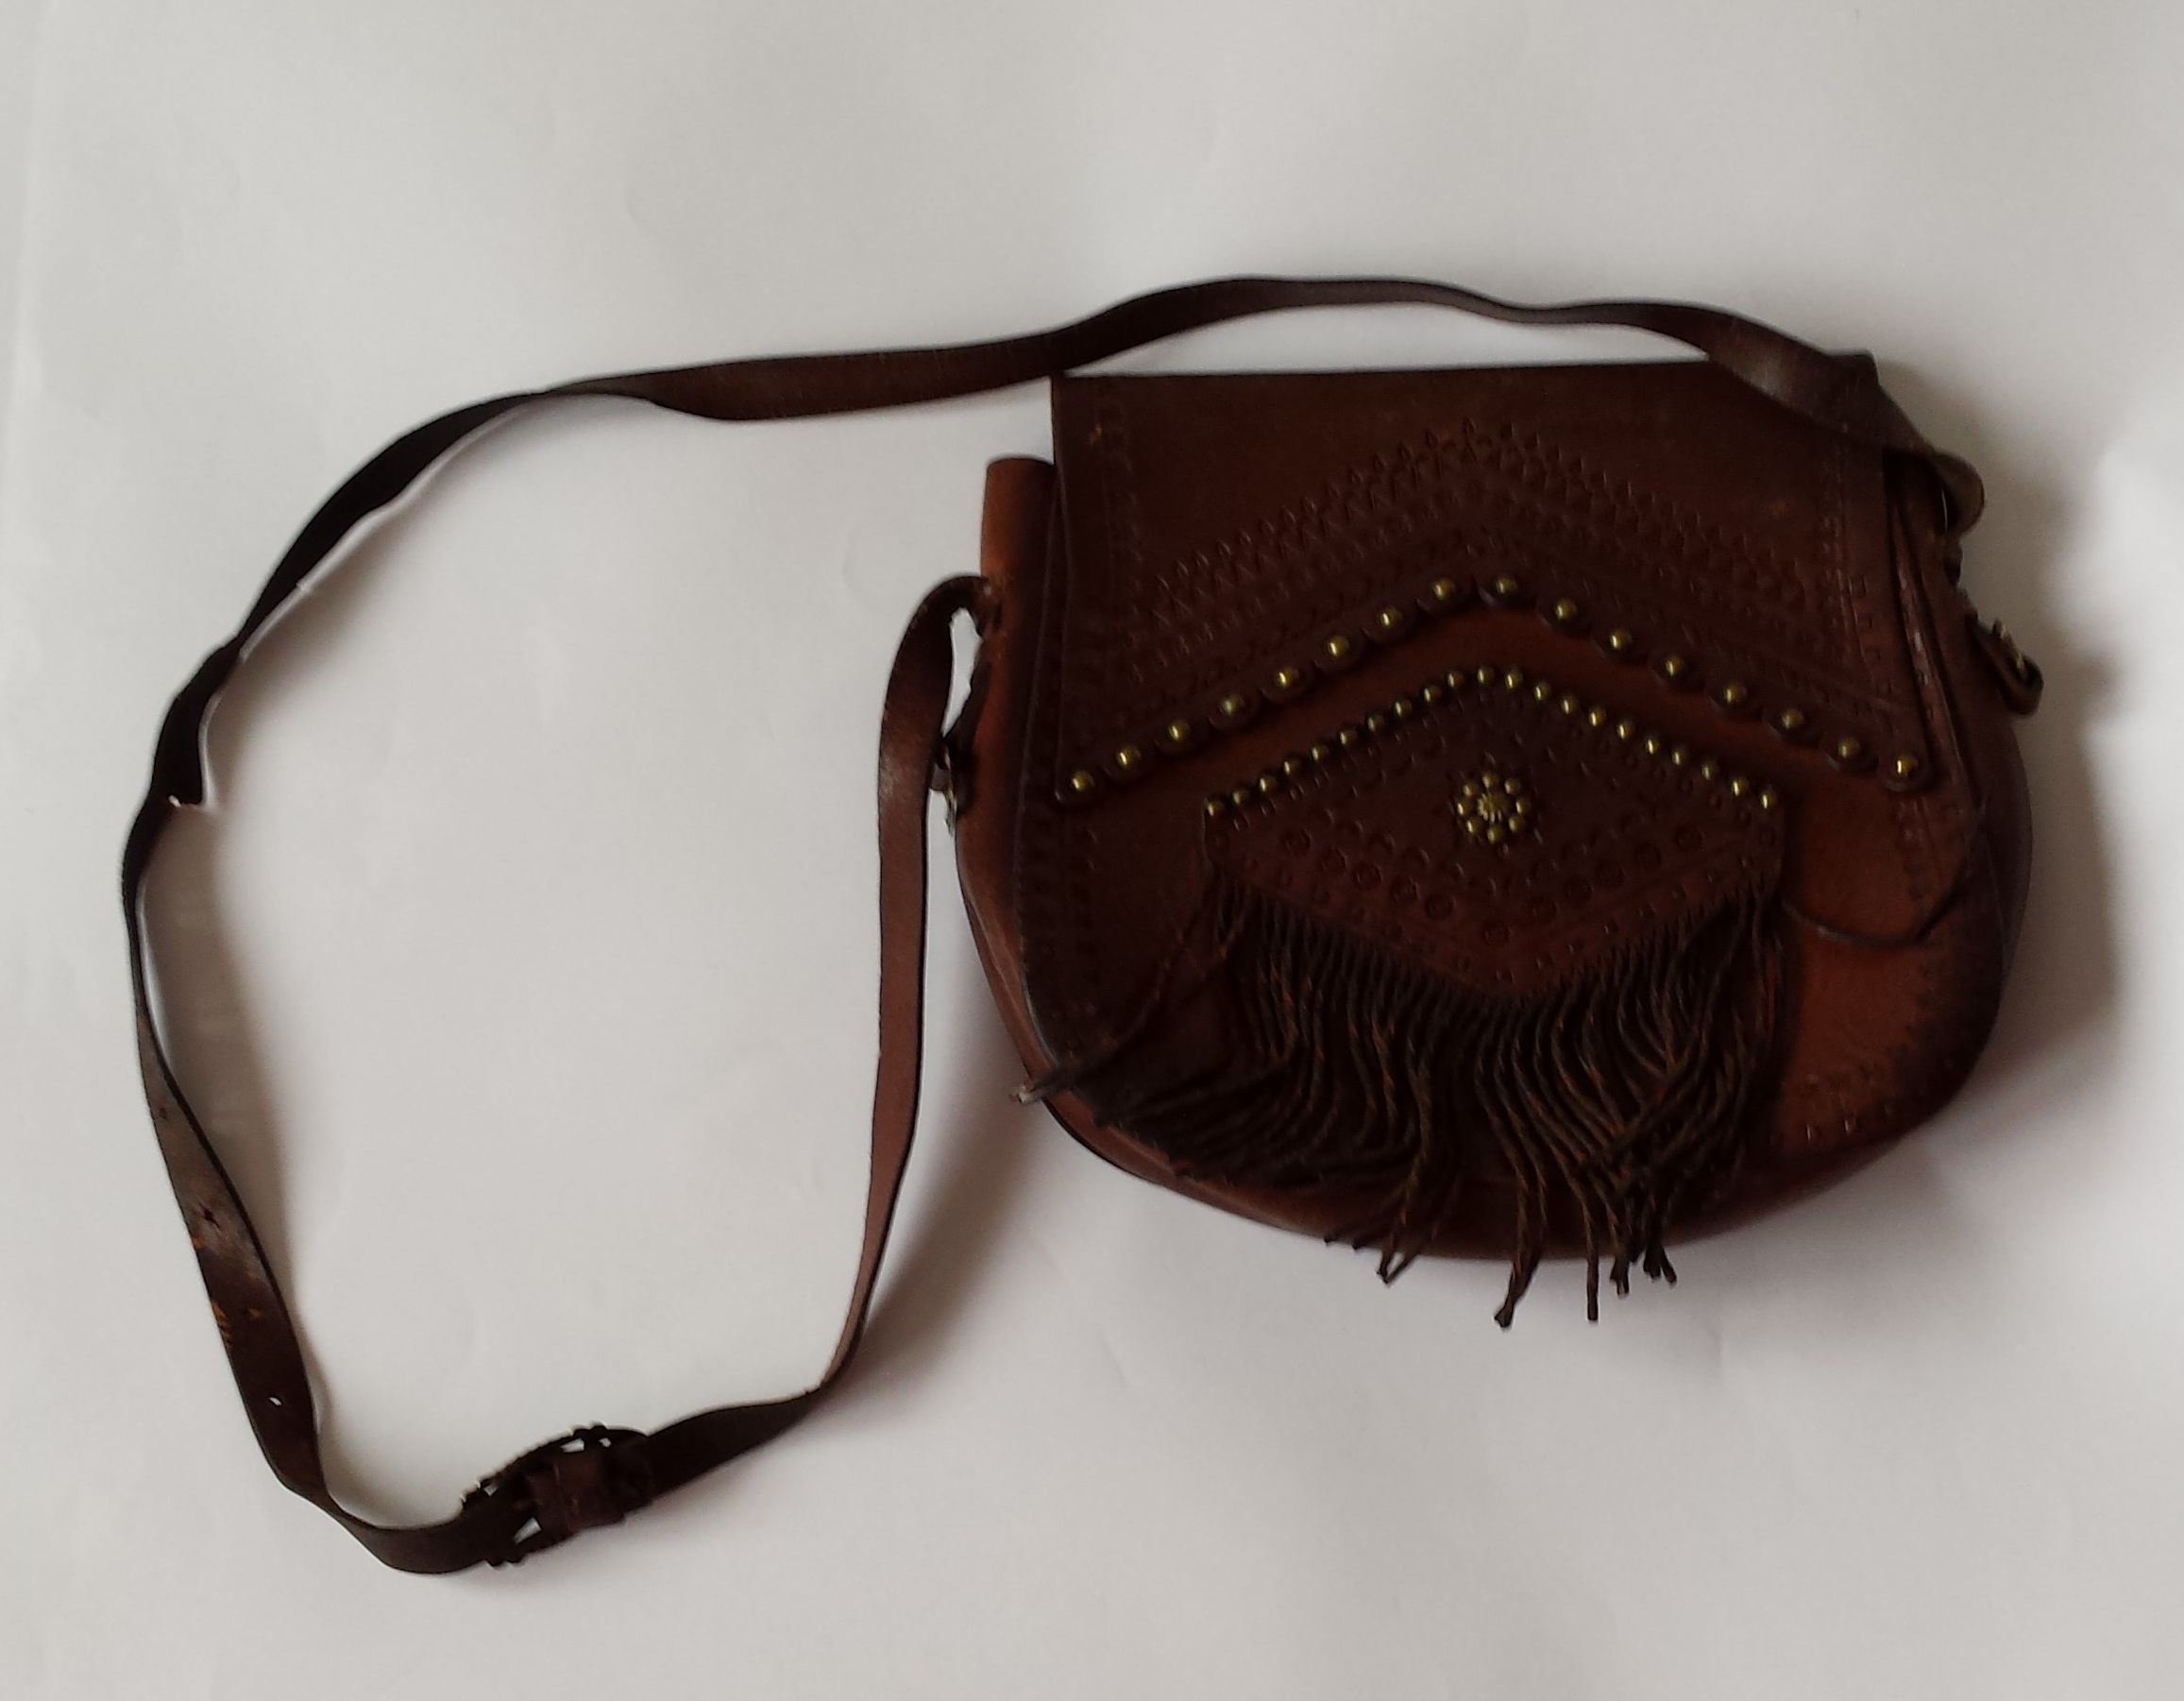 99bf55bcfab5c brązowa skórzana torebka boho vintage - 7200537986 - oficjalne ...